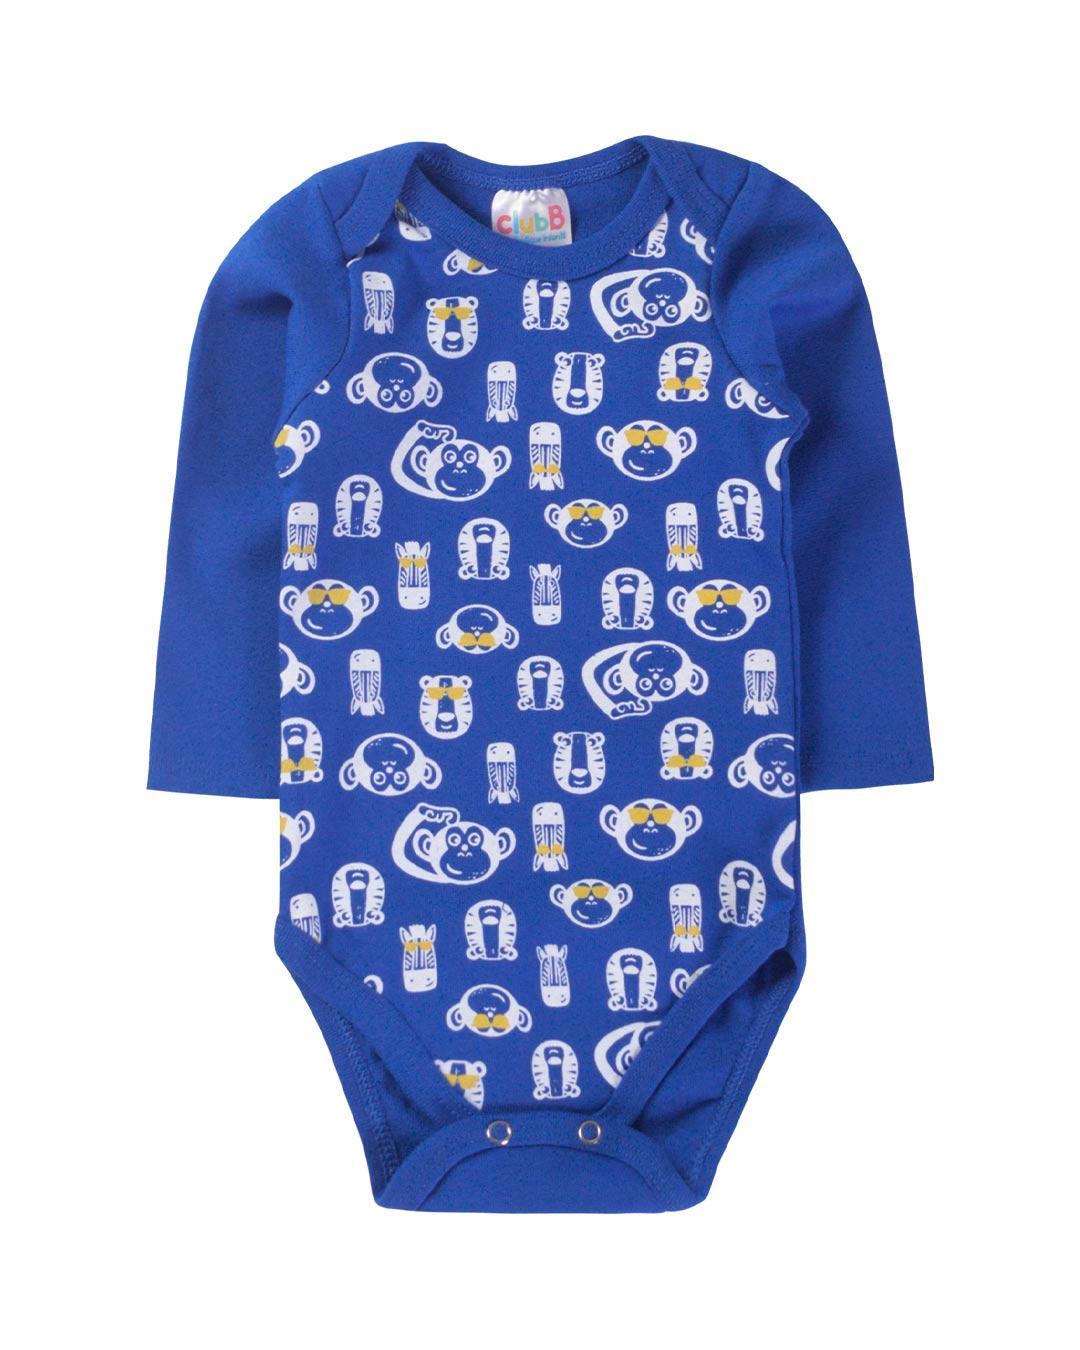 Kit Body 3 Peças Cool Kids Azul - Sorriso Kids